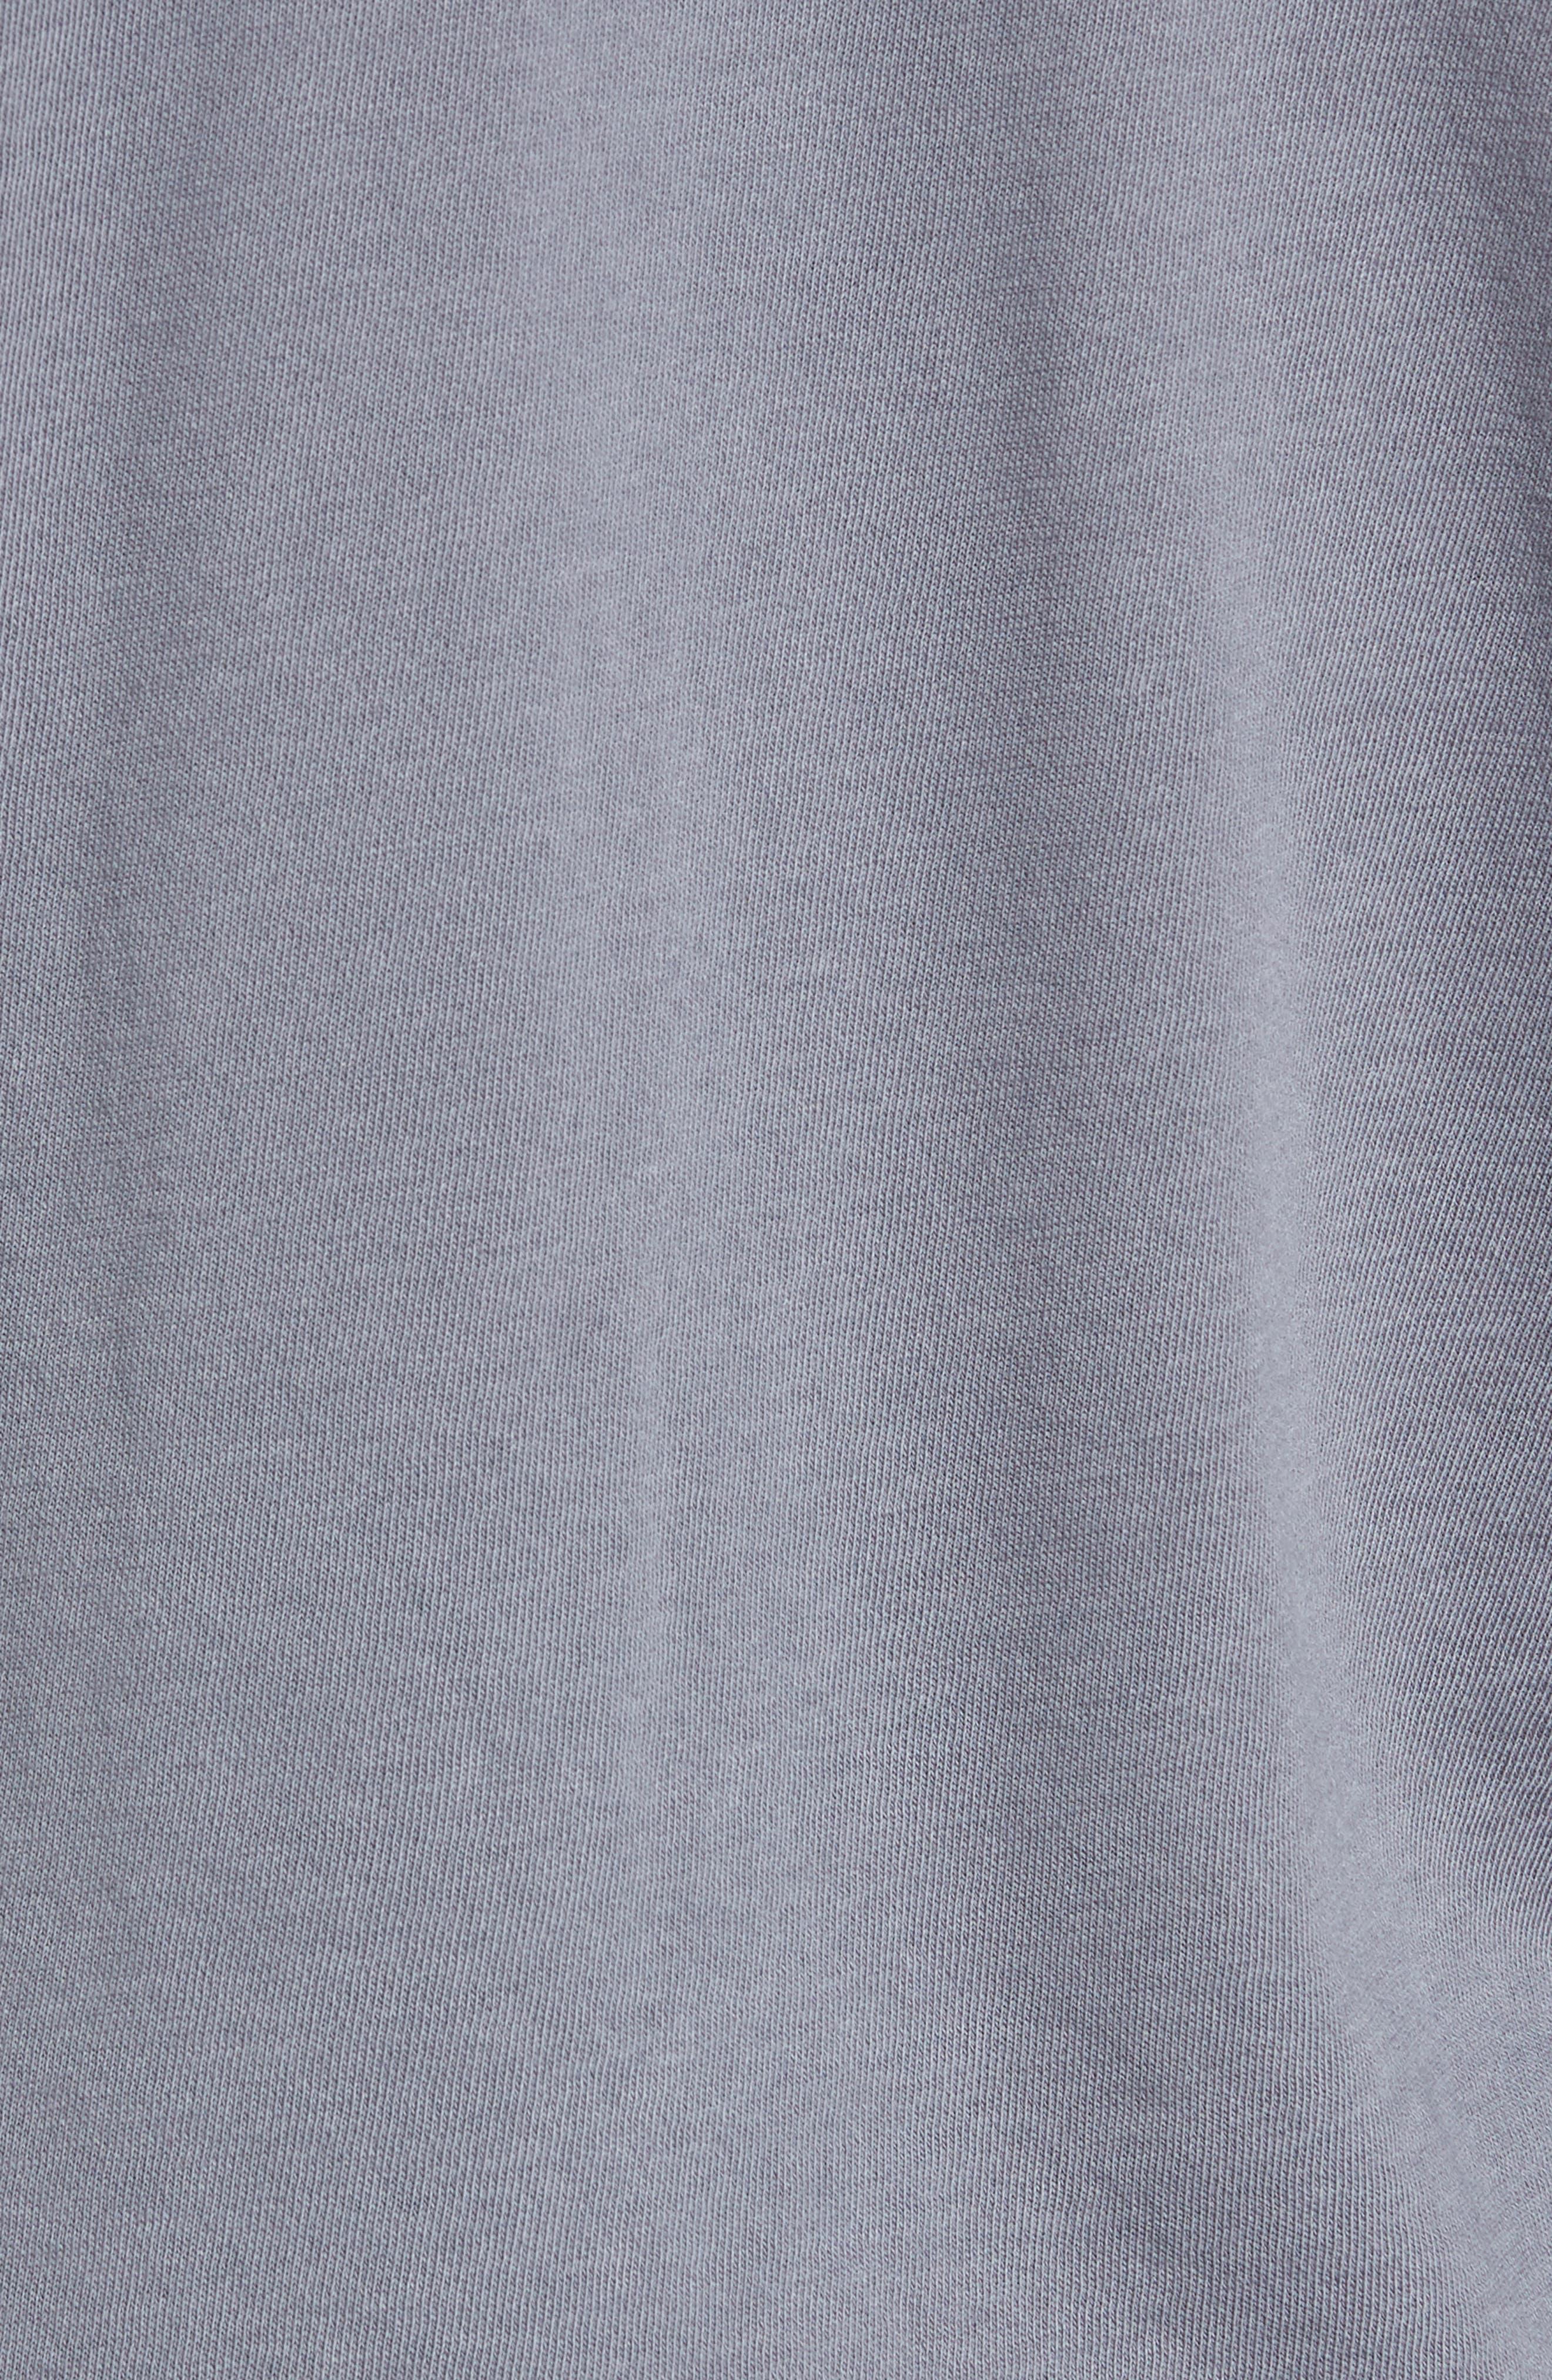 Raglan Crewneck Sweatshirt,                             Alternate thumbnail 5, color,                             029